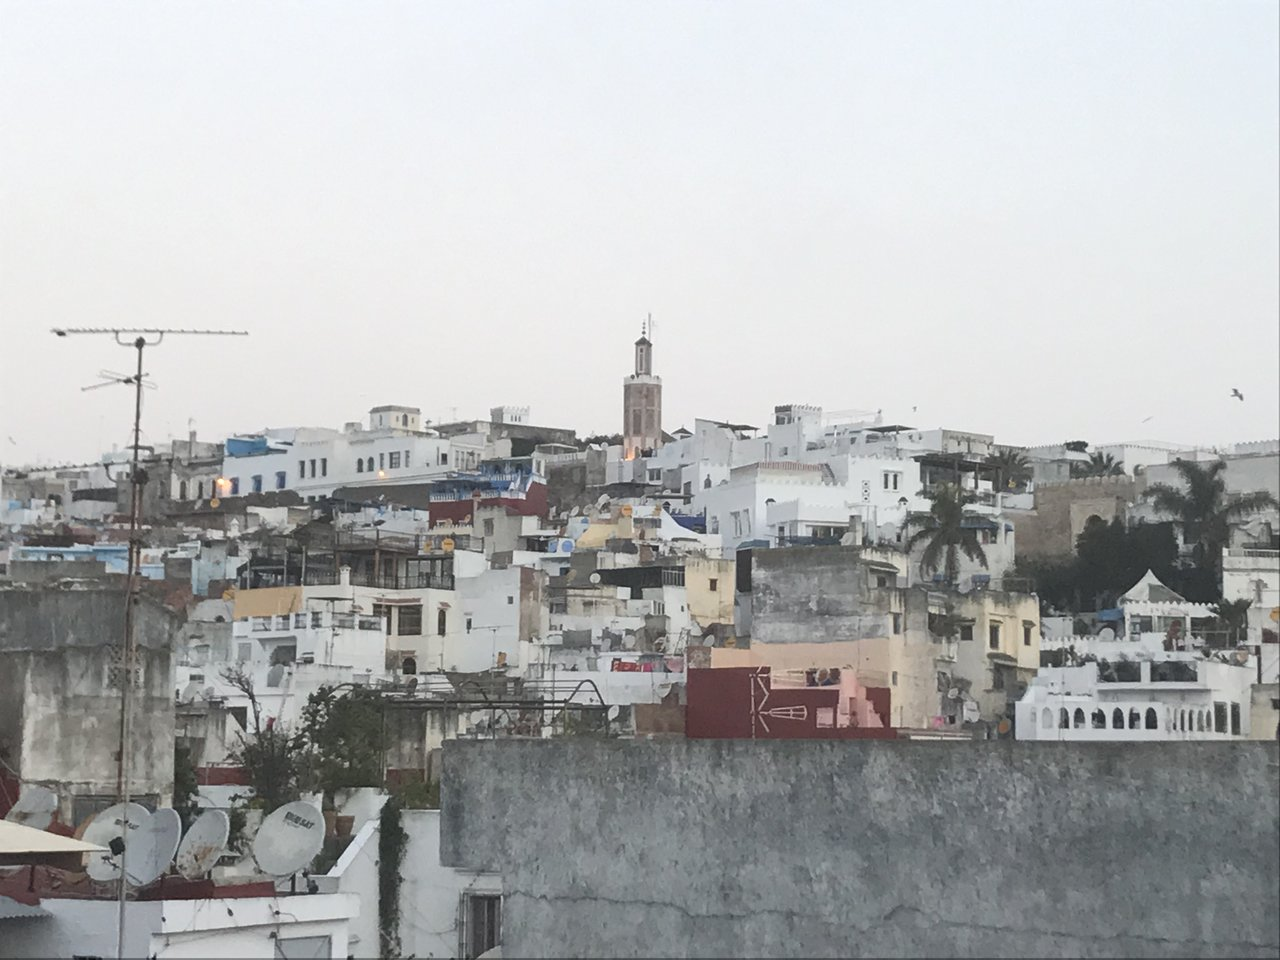 Tanger Médina | Photo taken by Chris M